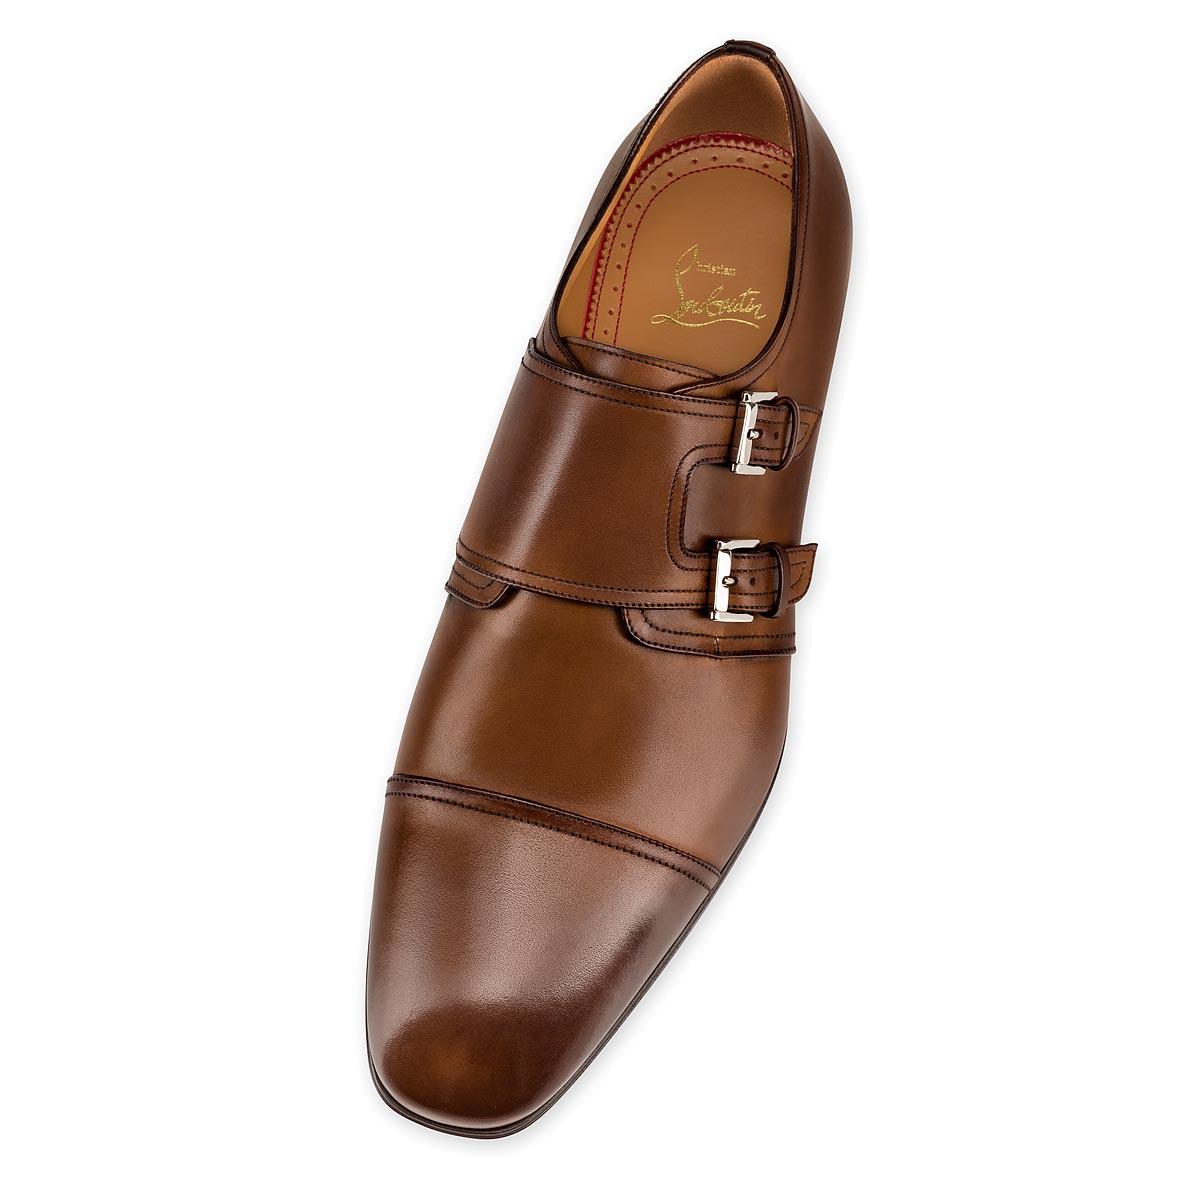 Men Shoes - Mortimer - Christian Louboutin